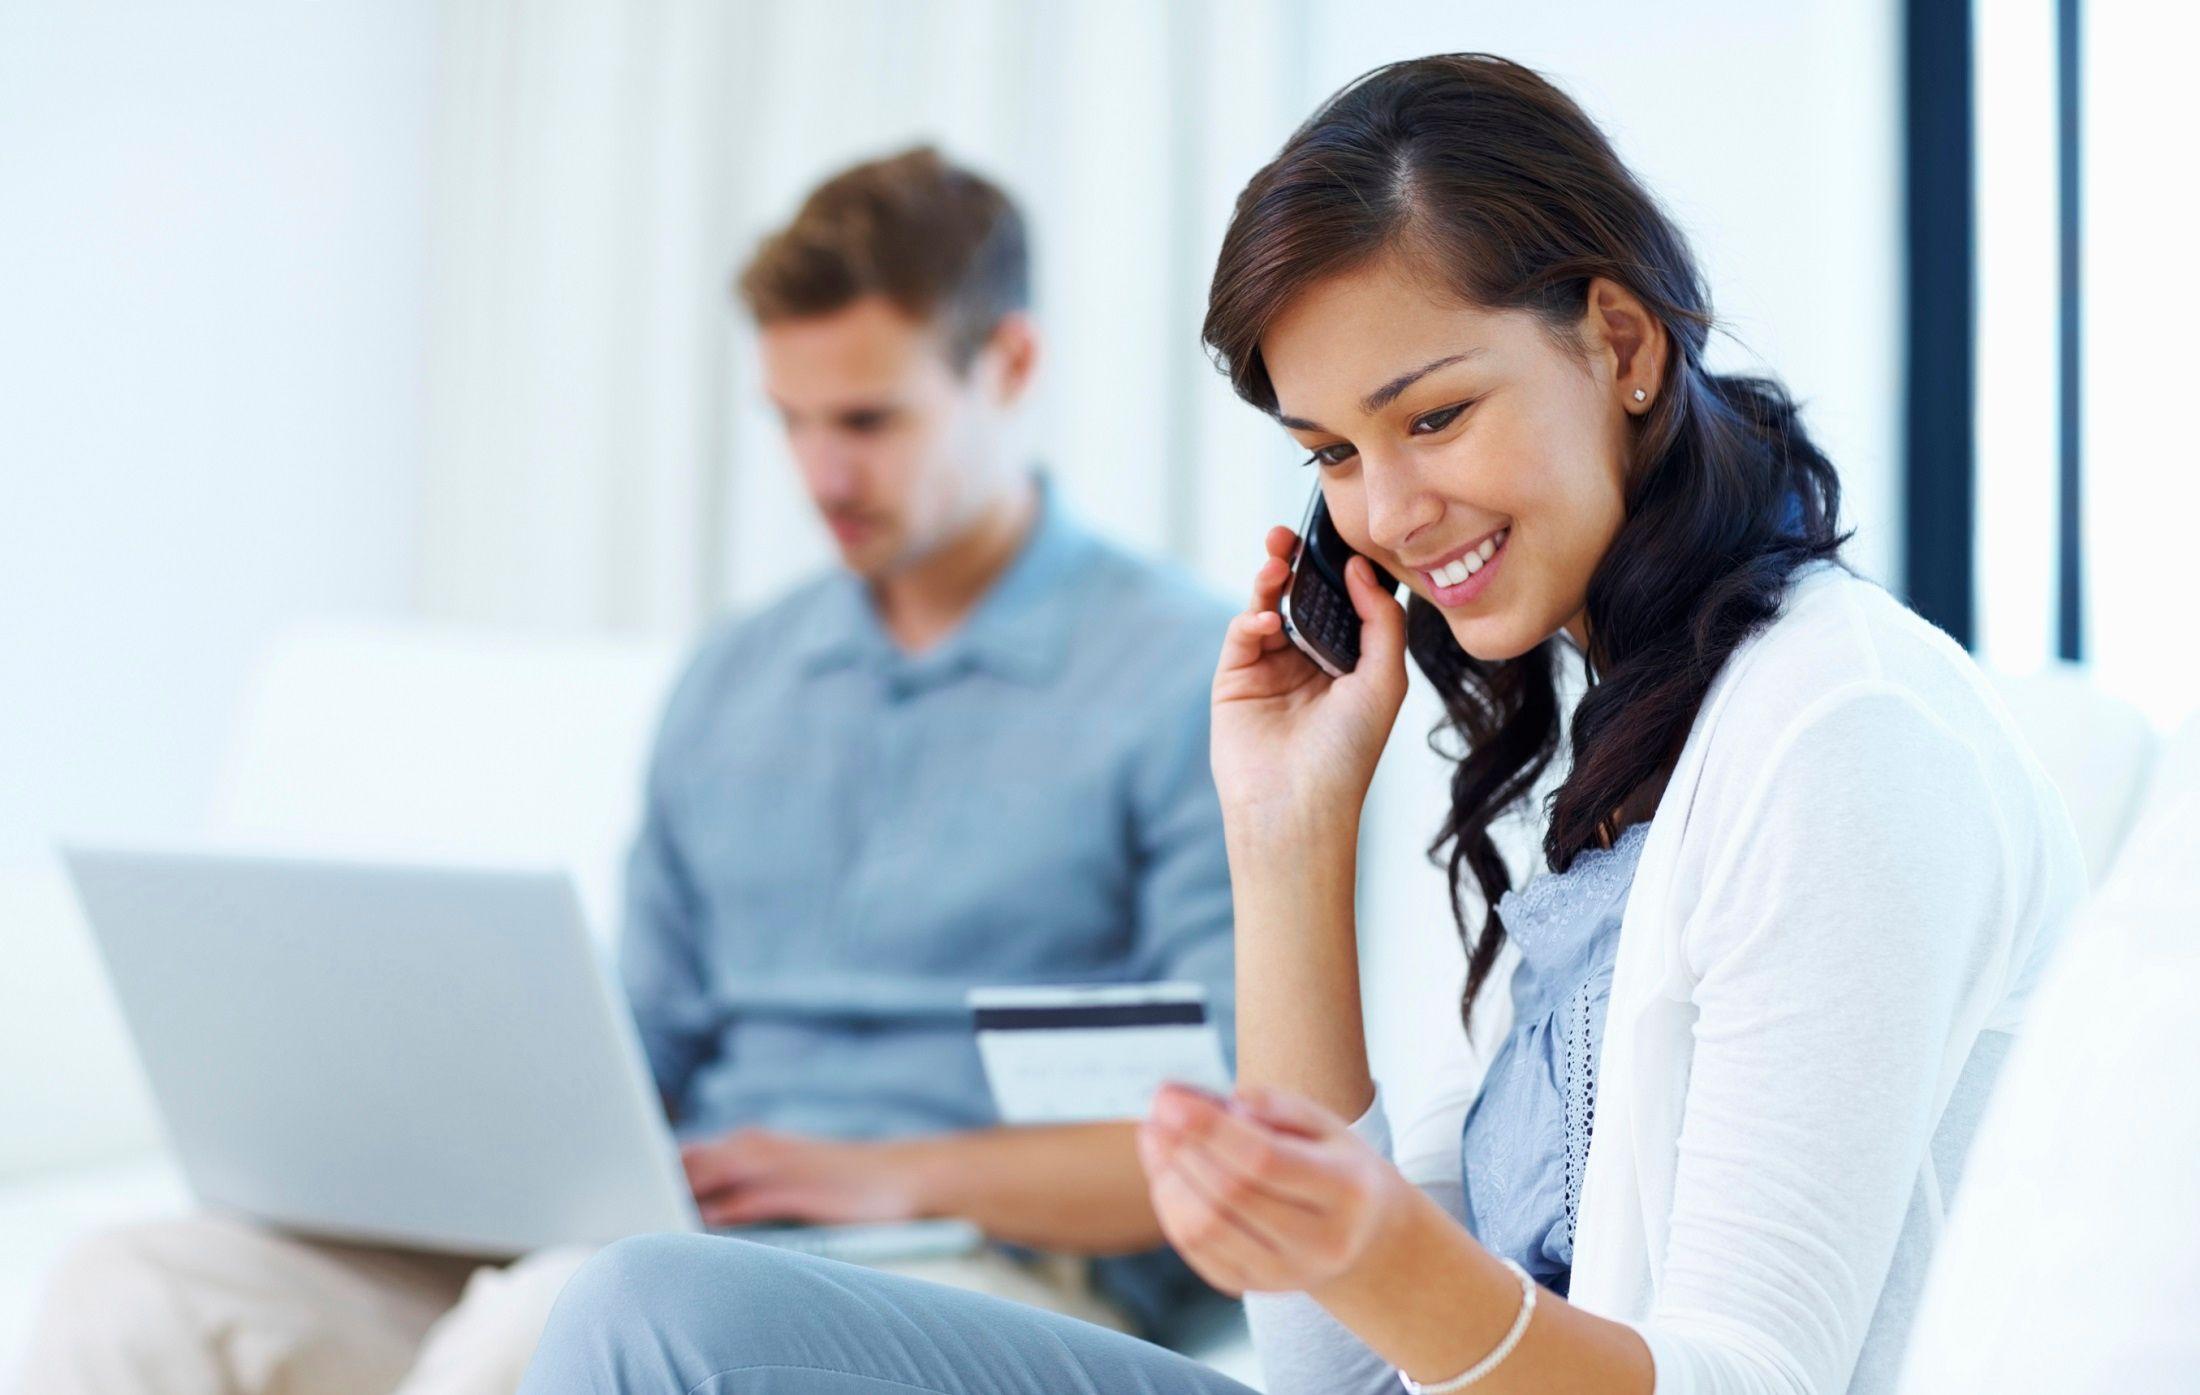 woman on phone credit card bills